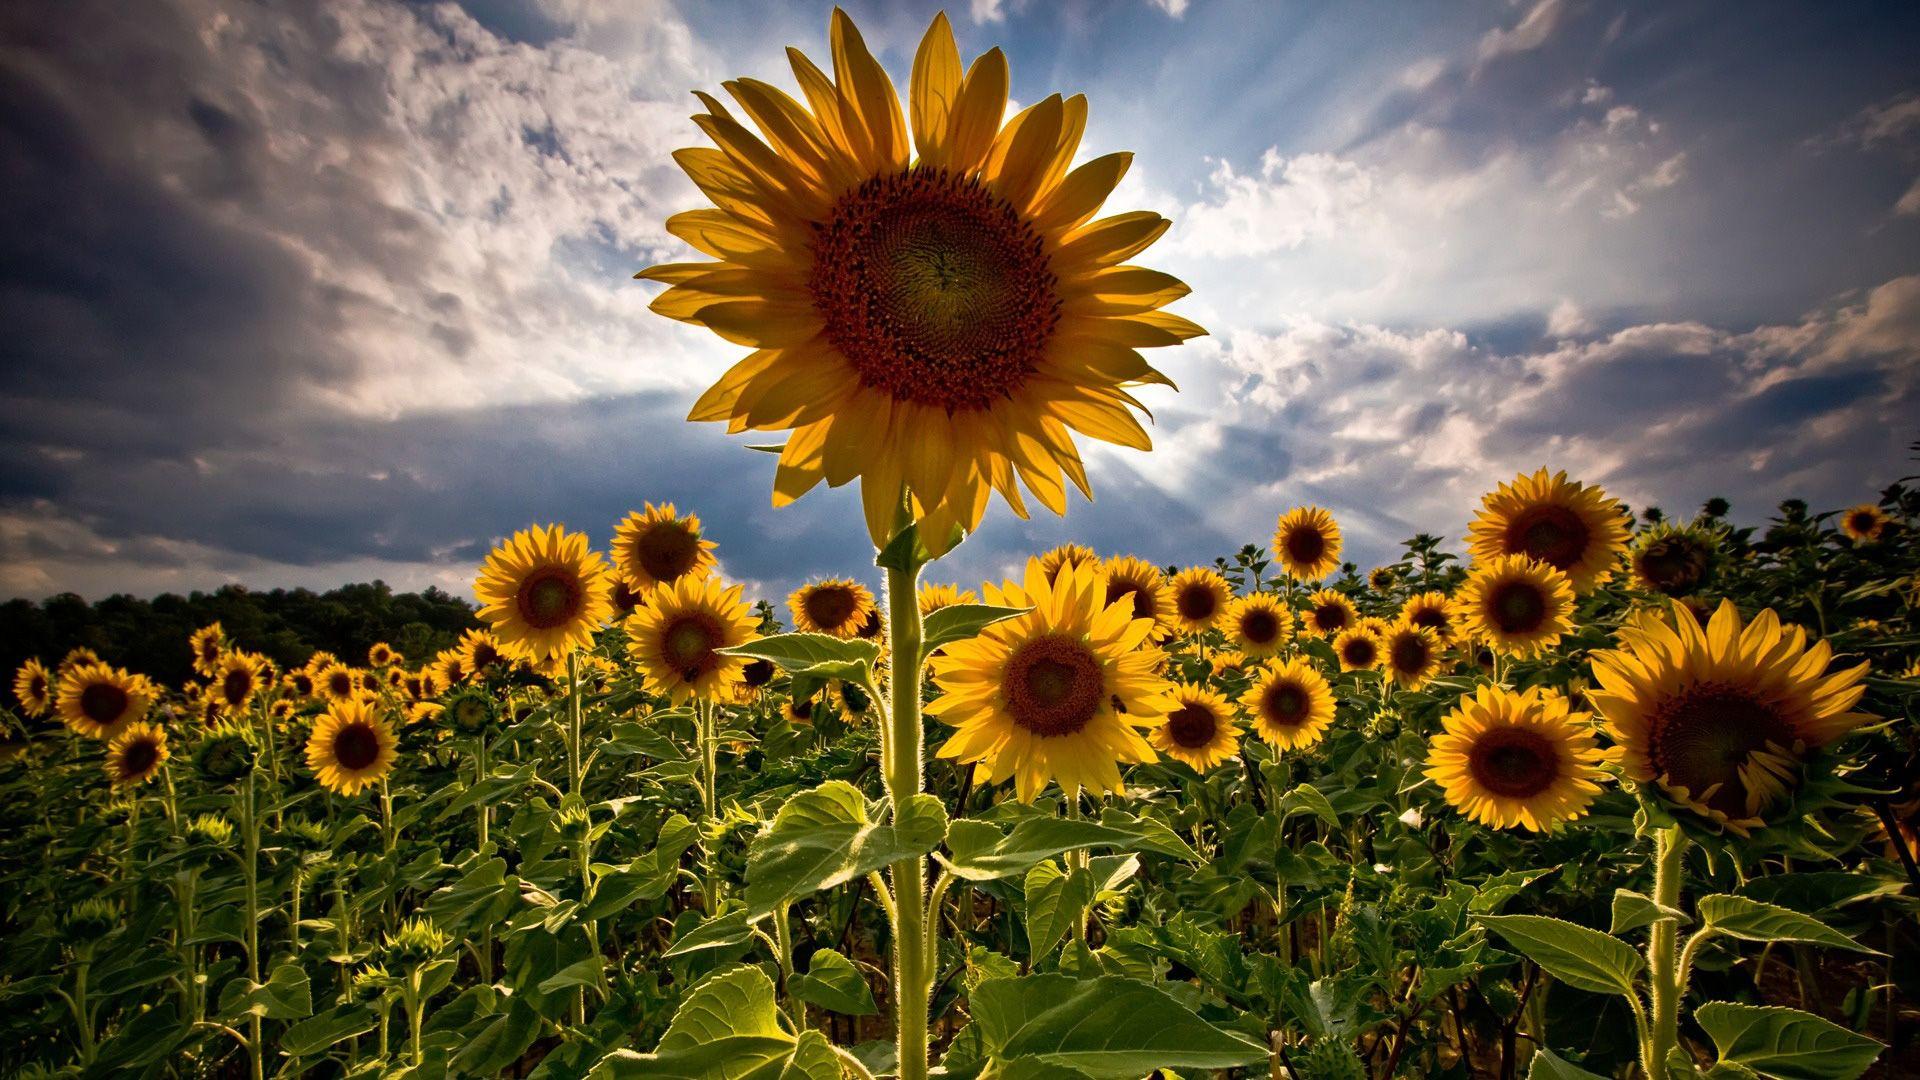 Field Of Sunflowers Sunflowers Field 1920x1080 16 9 Flower Background Images Sunflower Wallpaper Flower Backgrounds